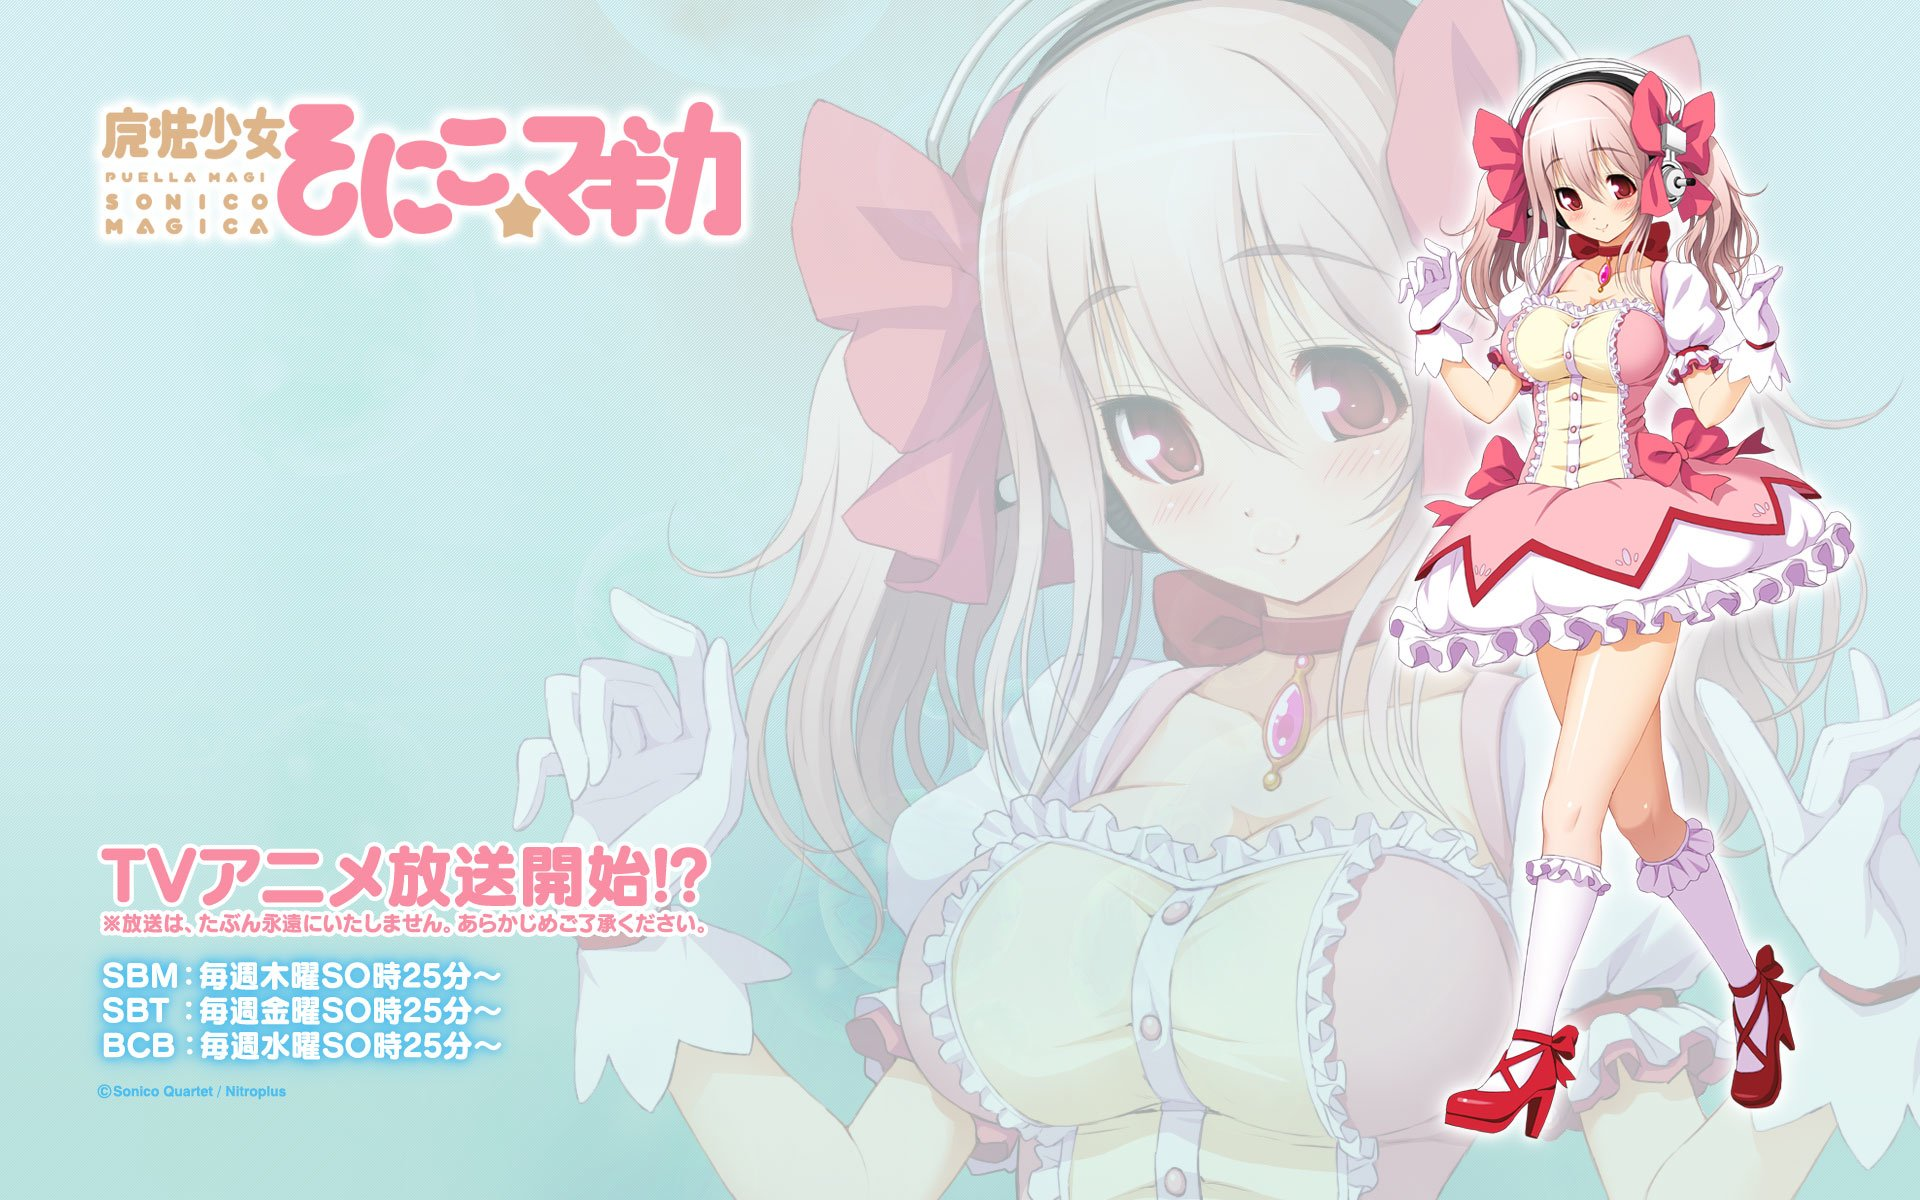 Kawaii Anime Girl Iphone Wallpaper Crossover Hd Wallpaper Background Image 1920x1200 Id